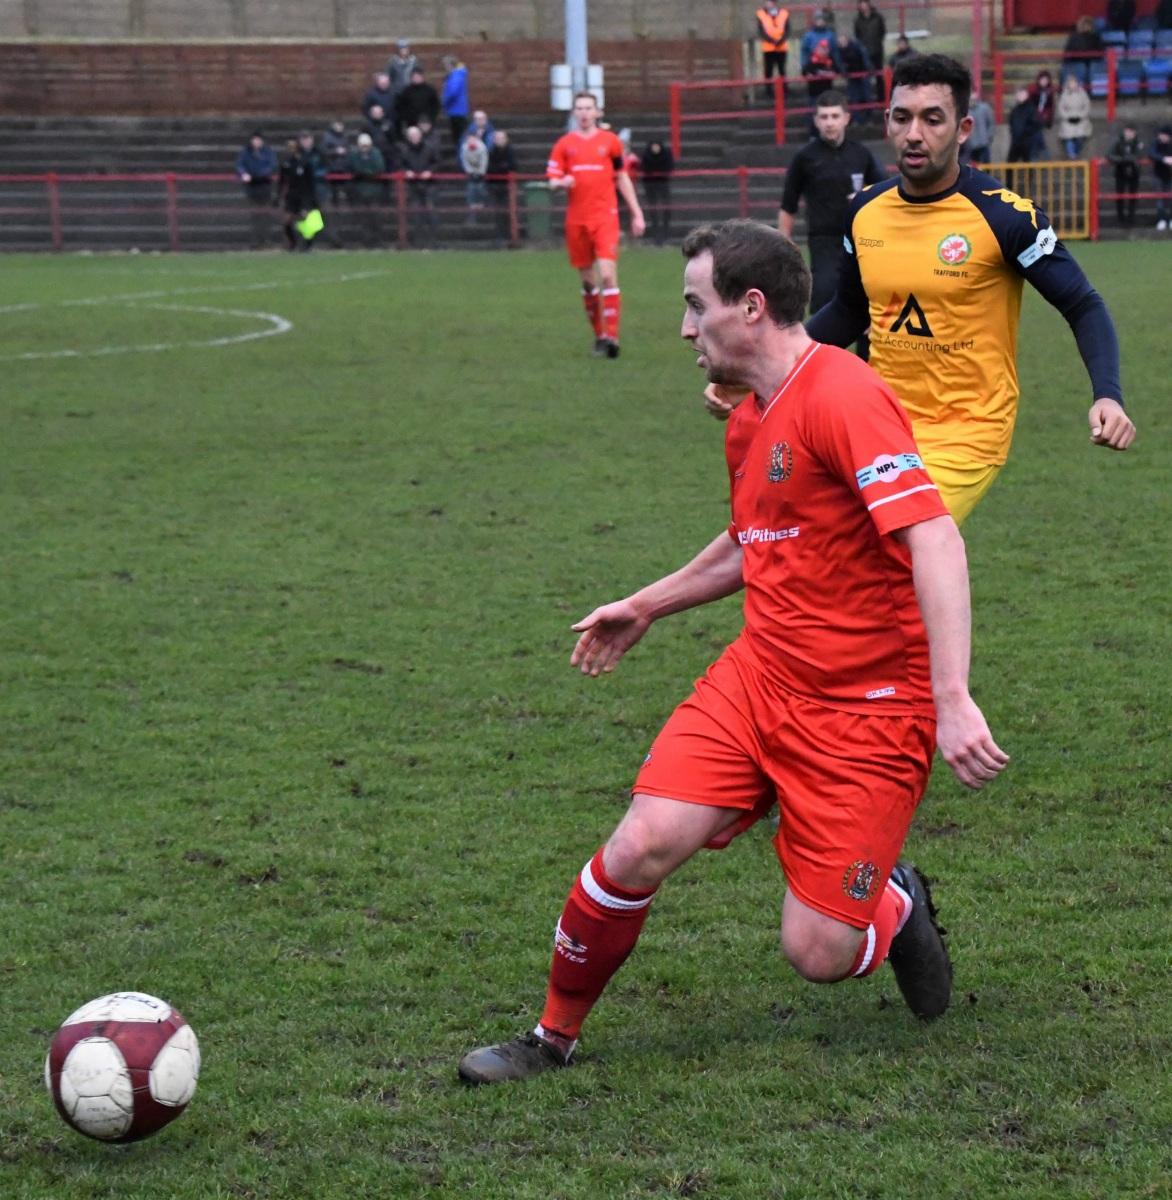 Workington-Reds-v-Trafford-Ben-Challis-14-scaled